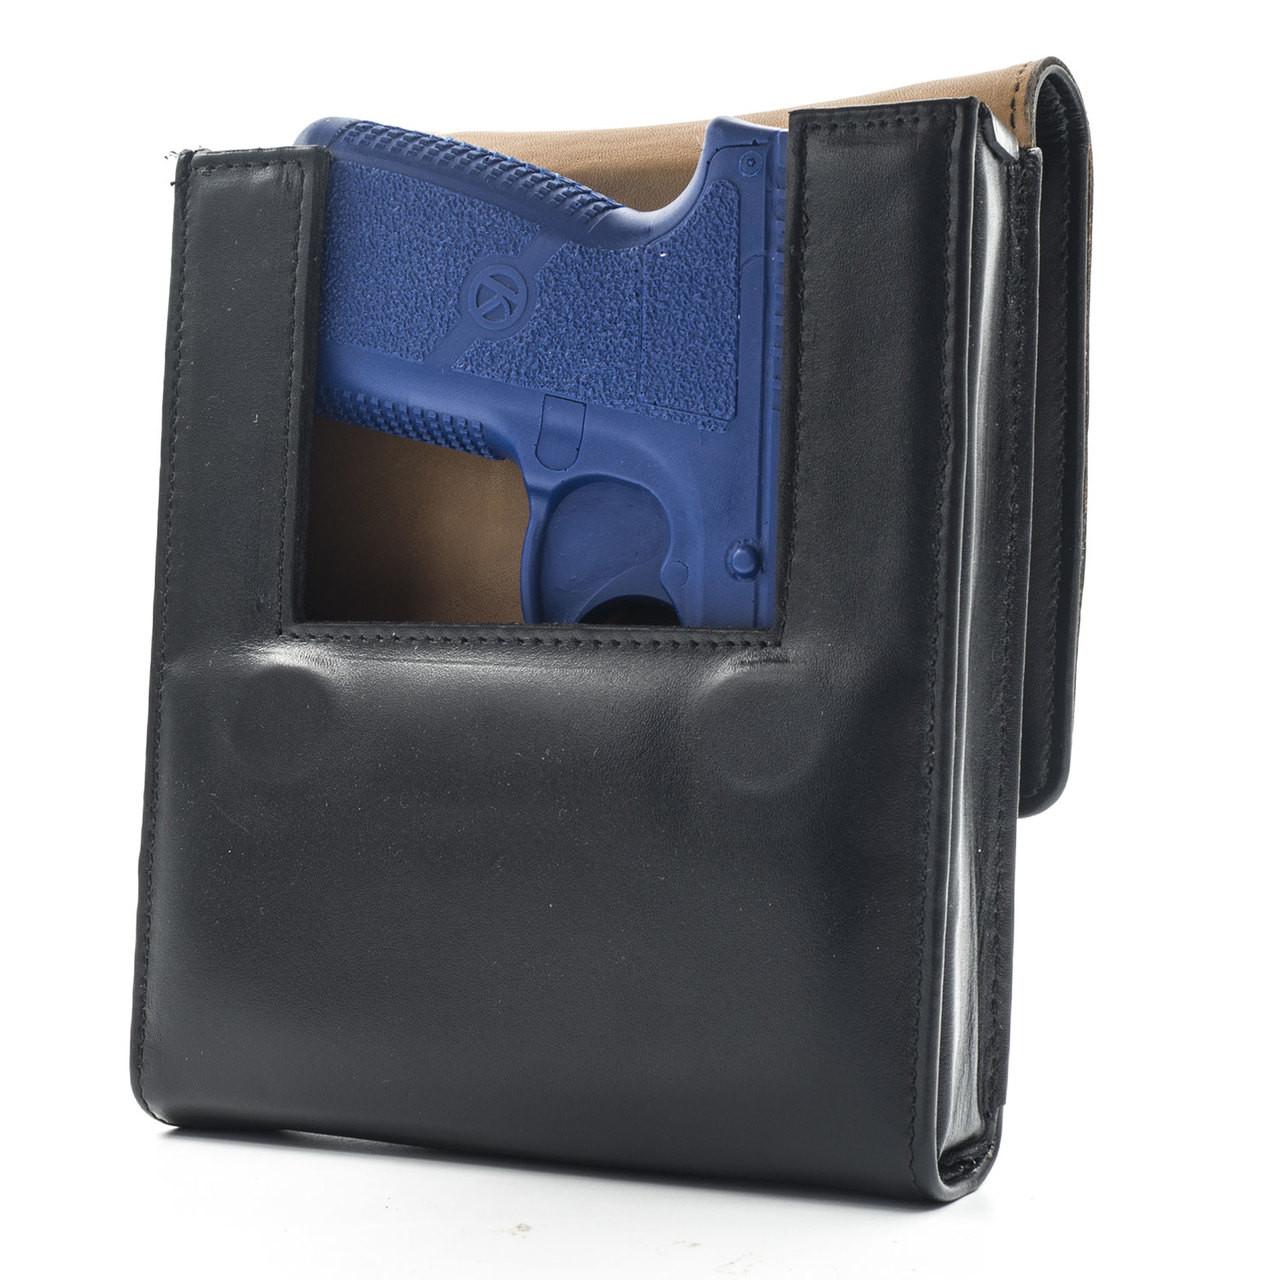 Kahr P40 Concealed Carry Holster (Belt Loop)